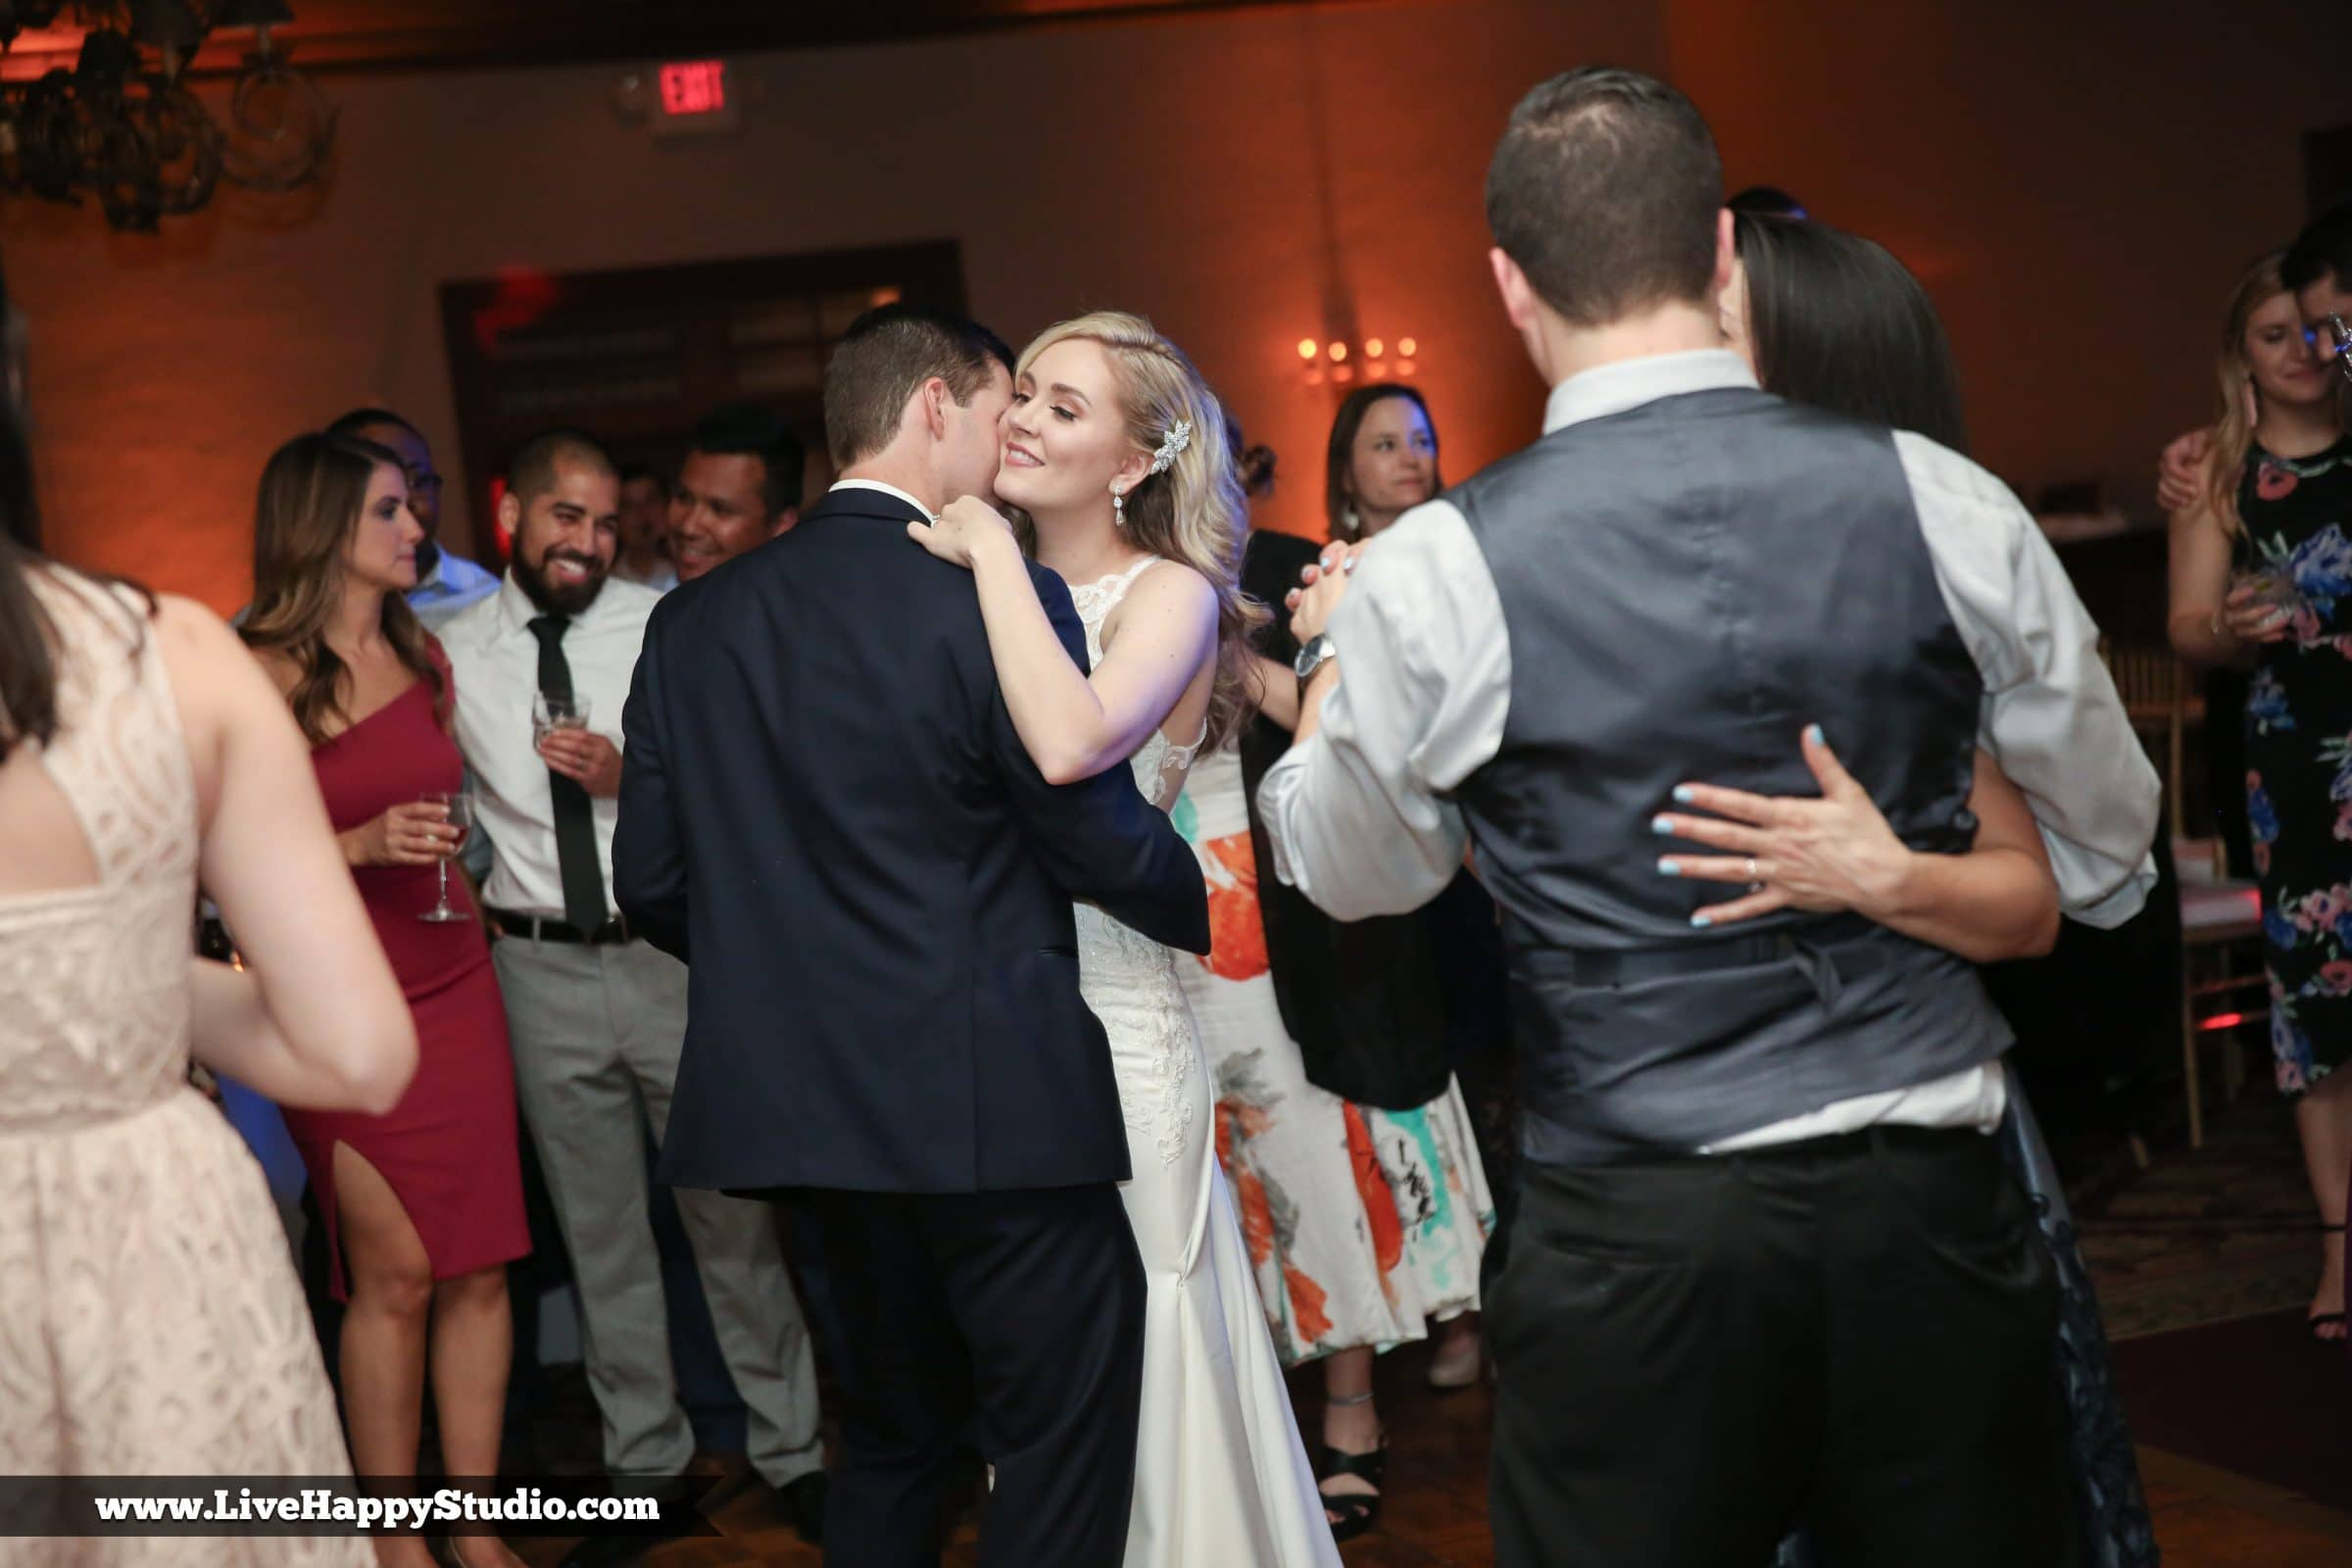 Bride and groom slow dancing at wedding reception